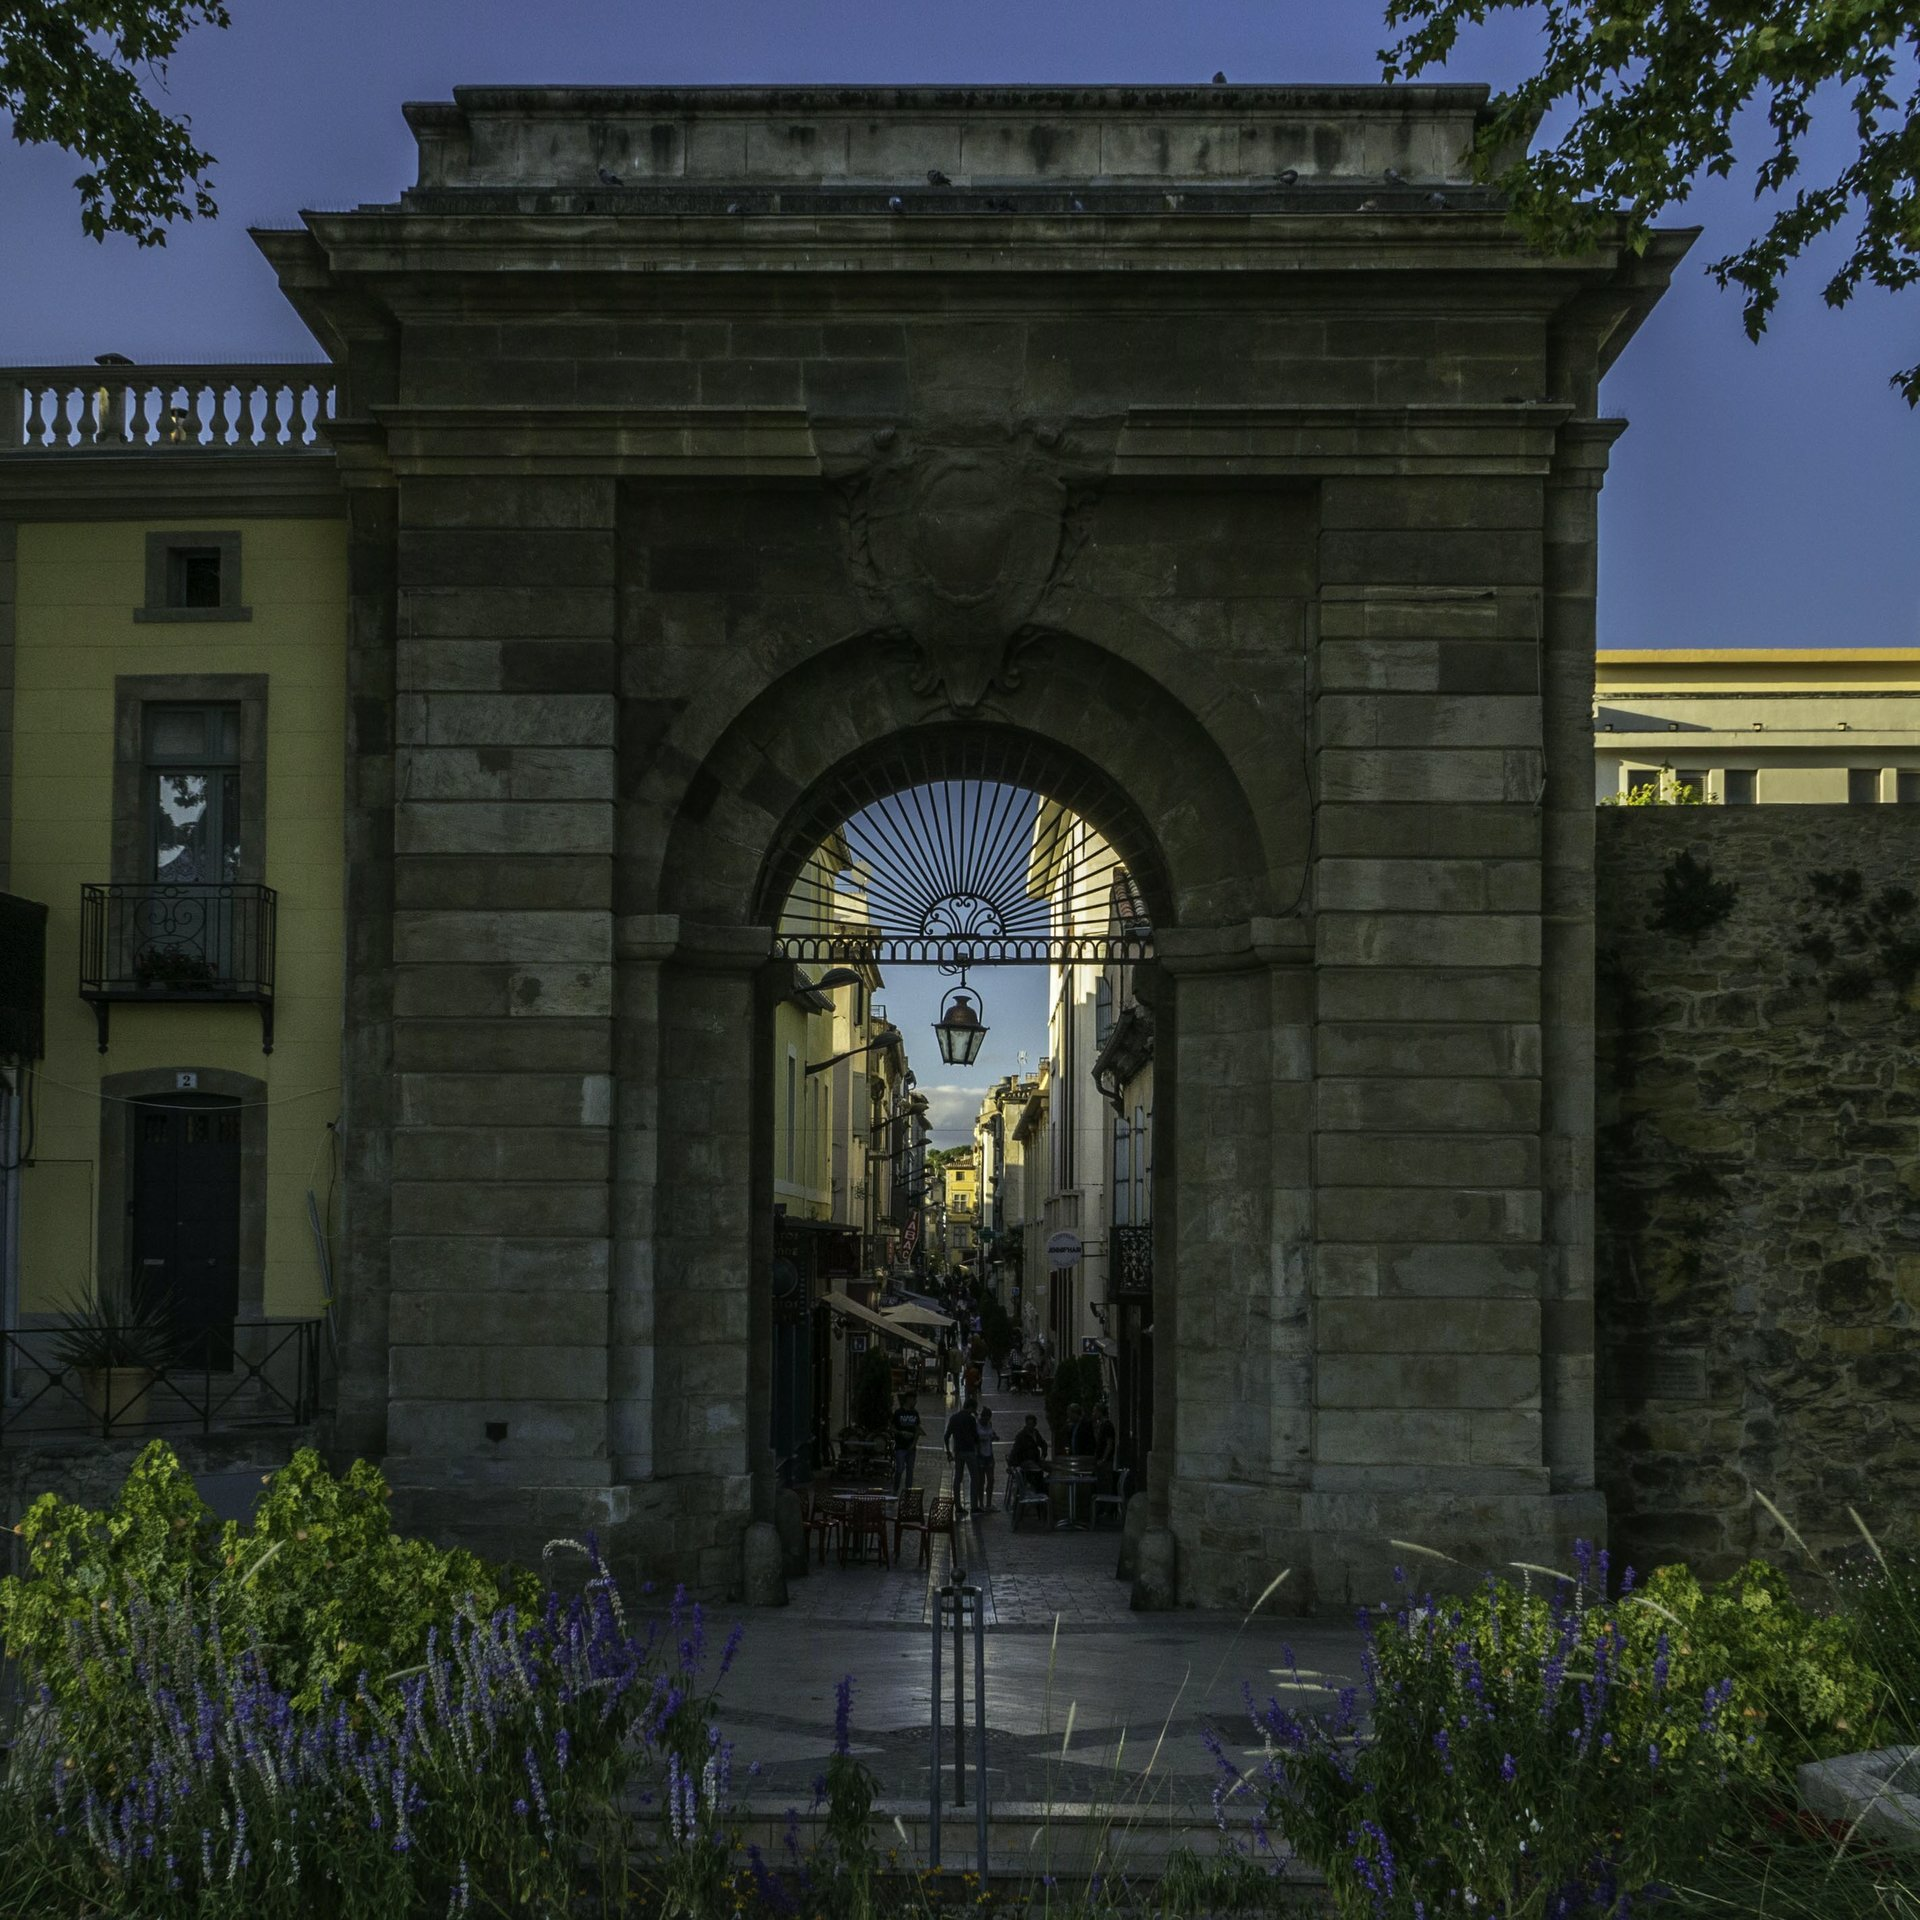 Portail des Jacobins in Carcassonne